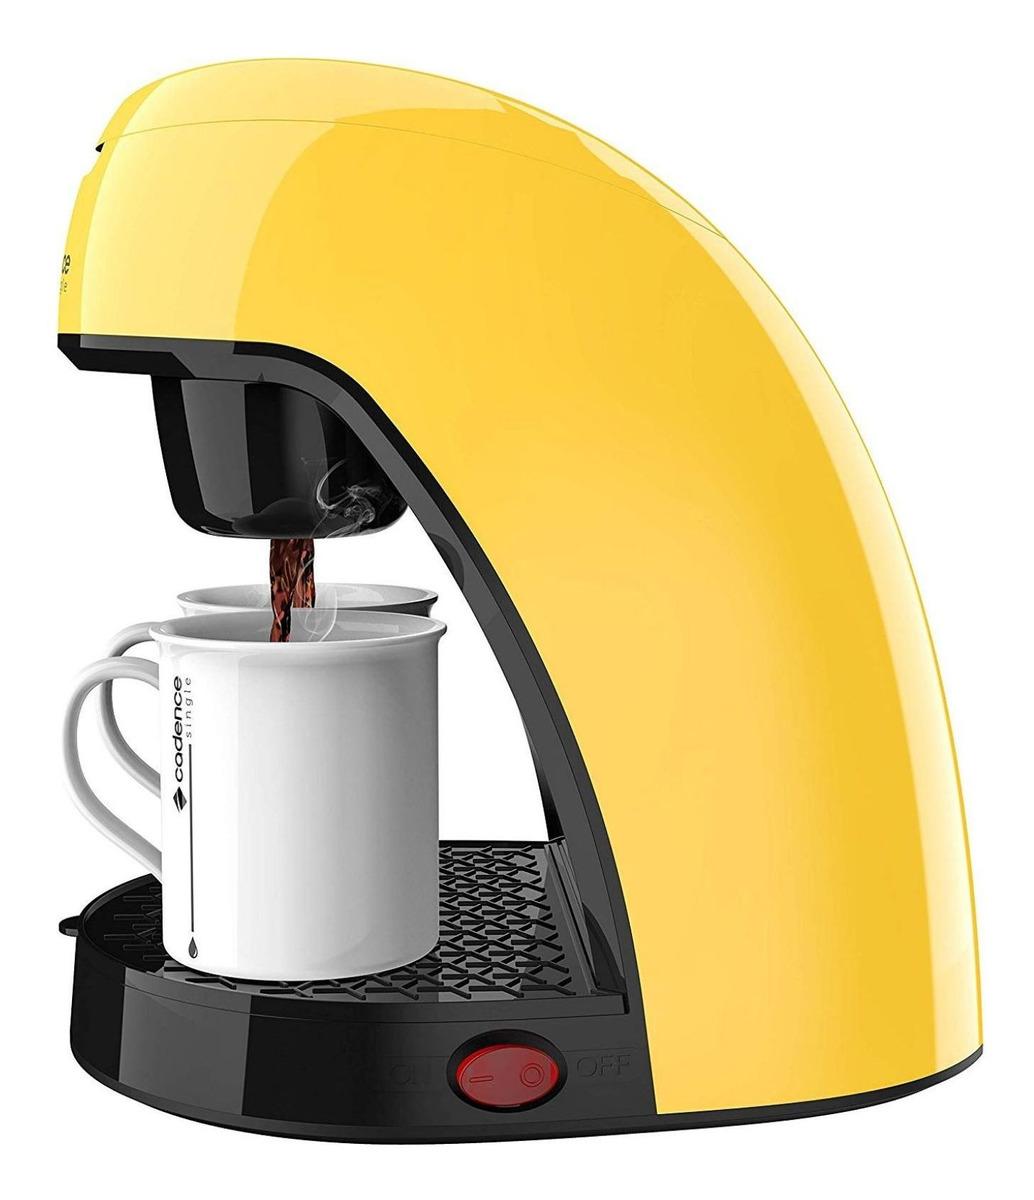 Cafeteira Cadence Single Colors Caf21 Amarelo